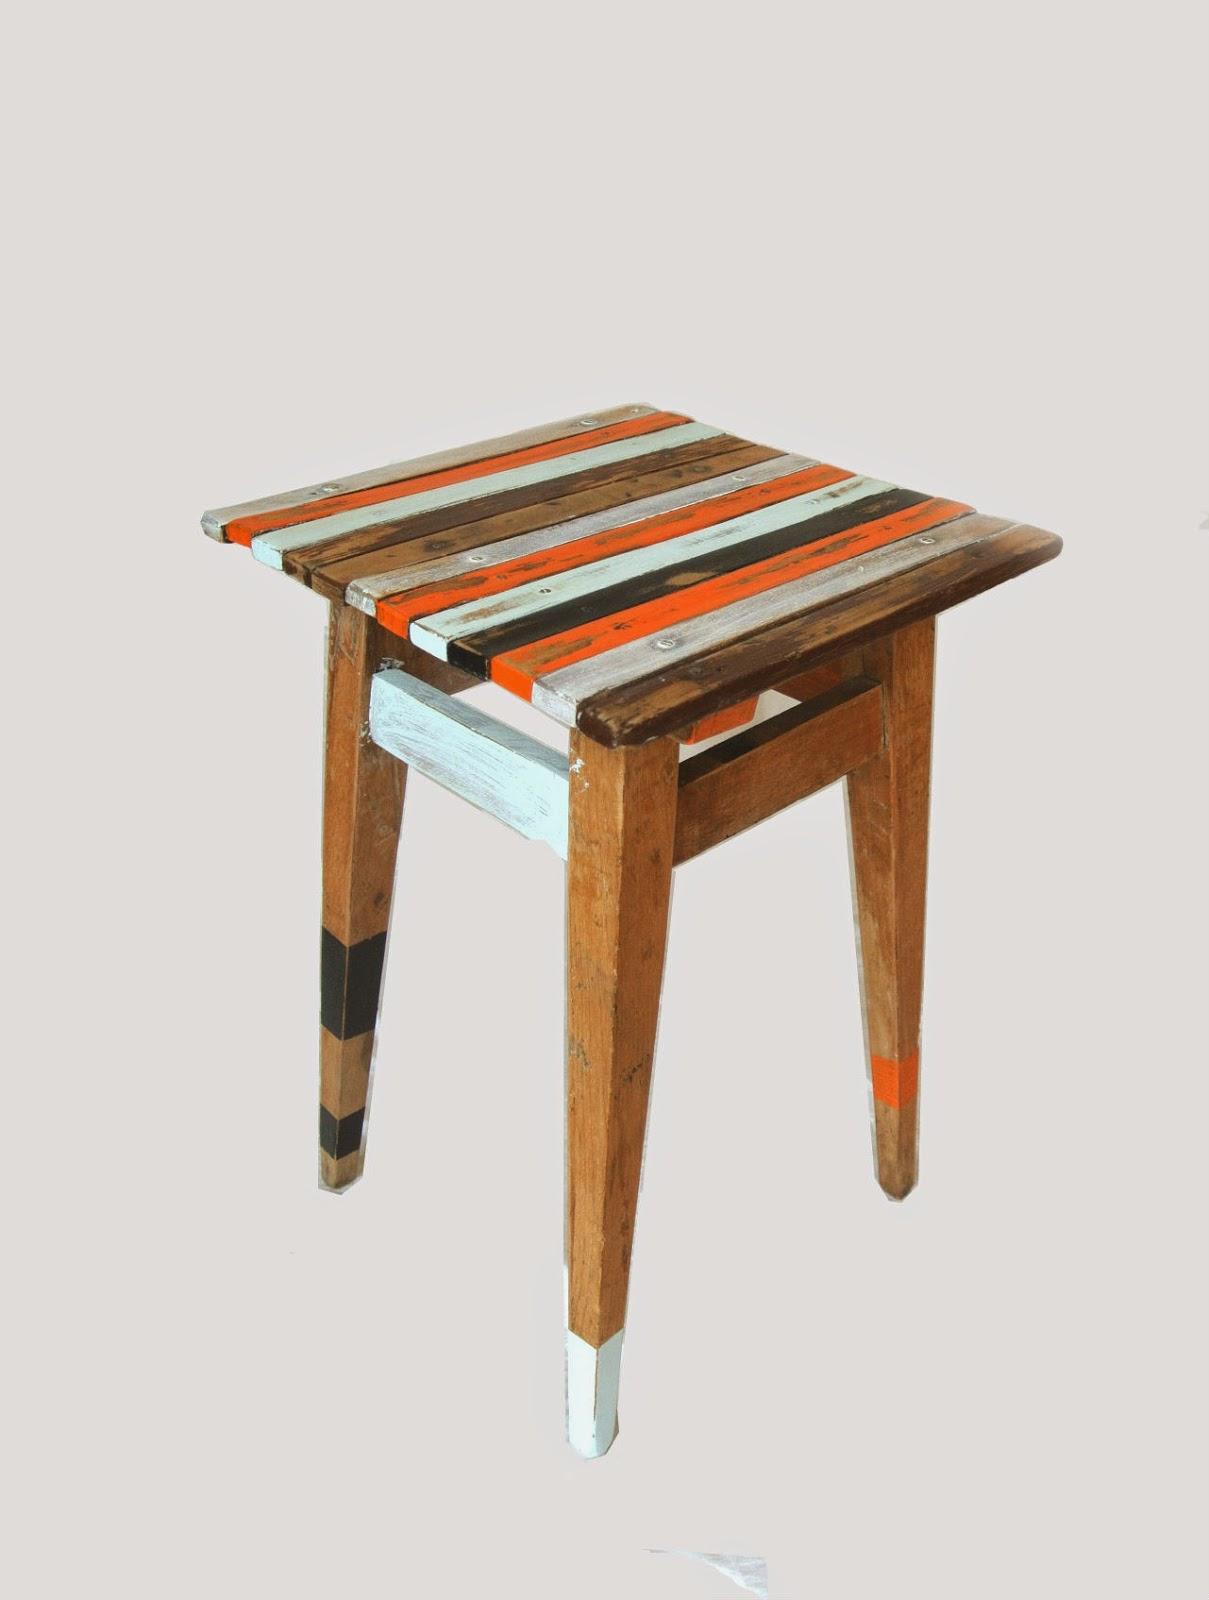 stołek,taboret,Vintage,stare deski,malowanie drewna,stołek vintage,jak zrobić stołek vintage,co to jest vintage,skarpetki na meblach,mebel,krzesło,krzesełko